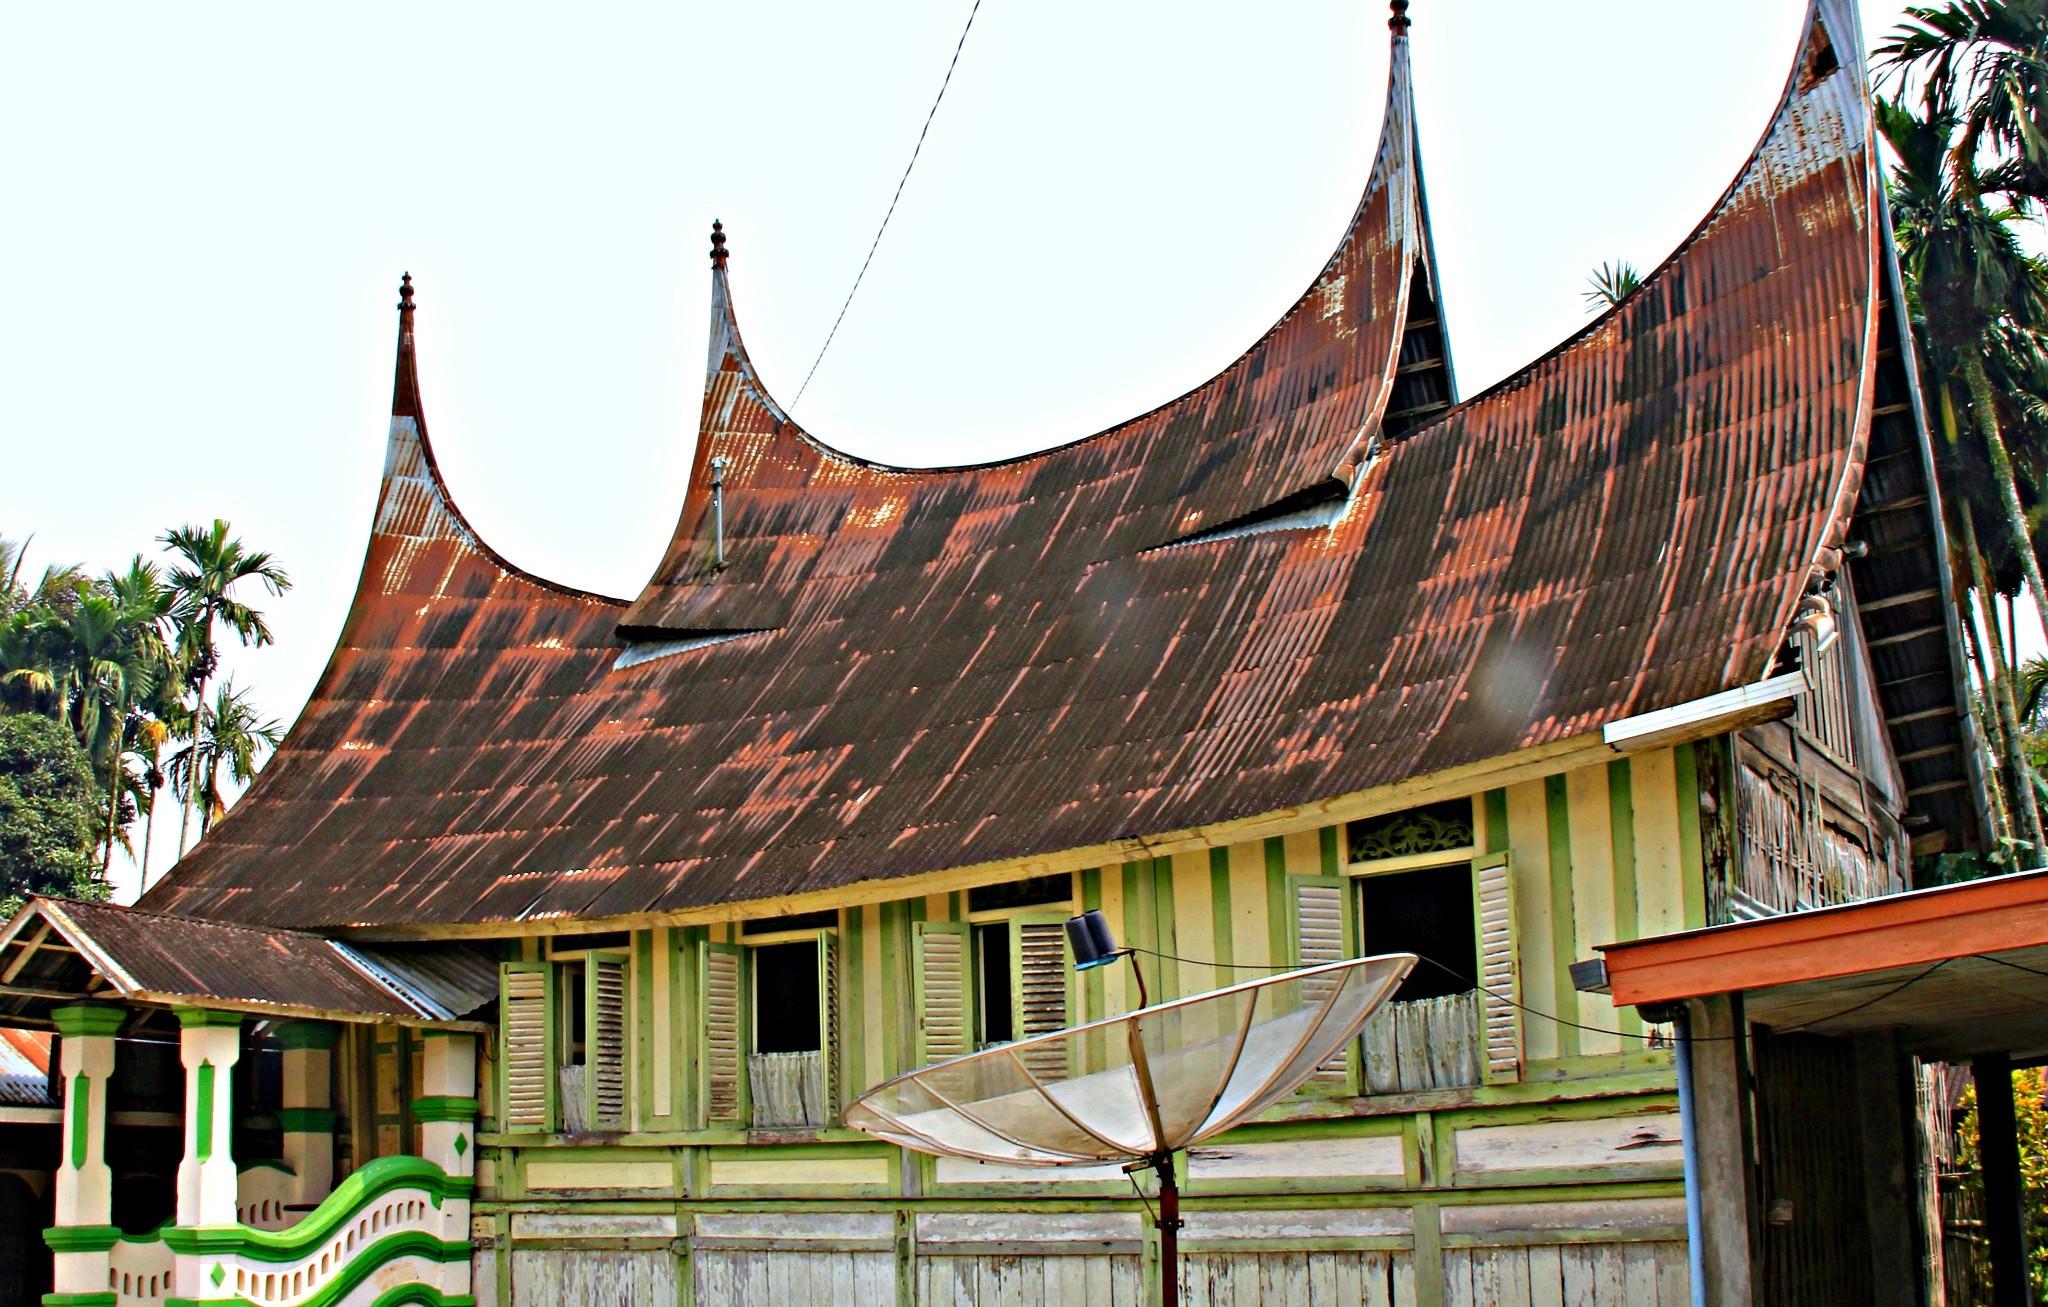 Traditional house in Minangkabau. Photo by Ovidiu Balaj